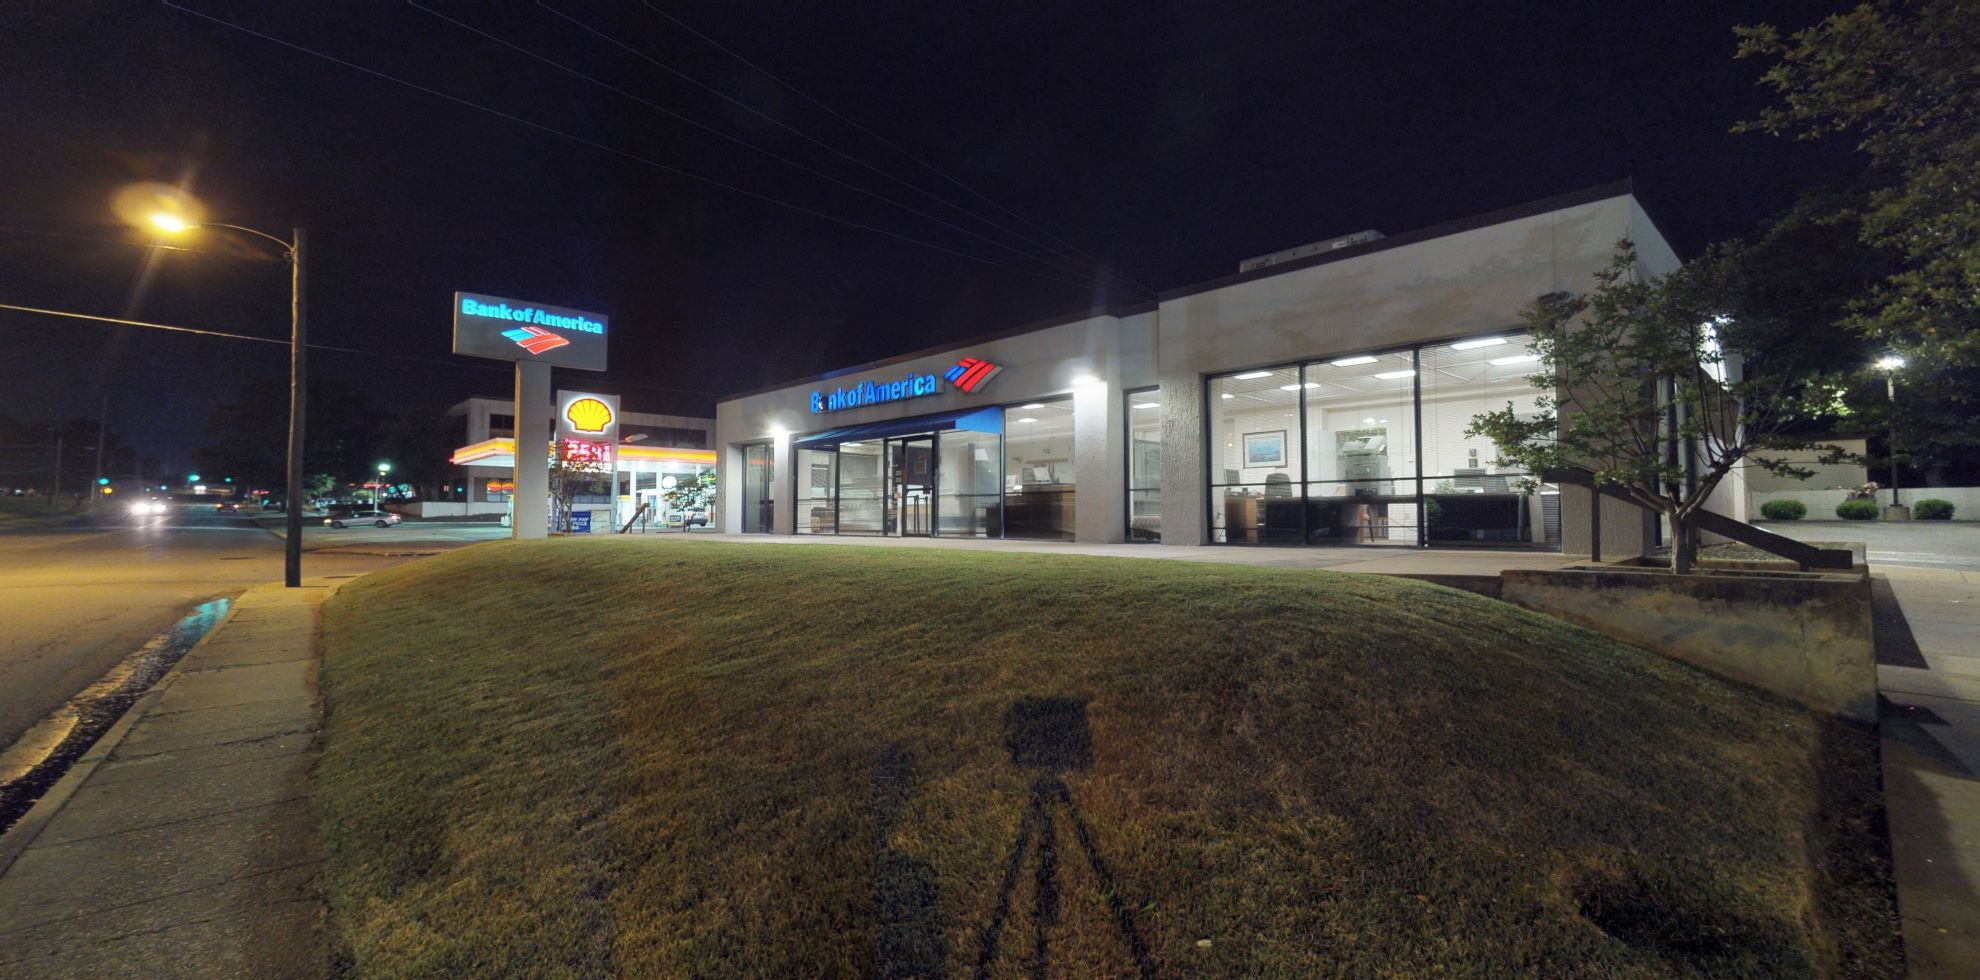 Bank of America financial center with drive-thru ATM   4024 W Markham St, Little Rock, AR 72205